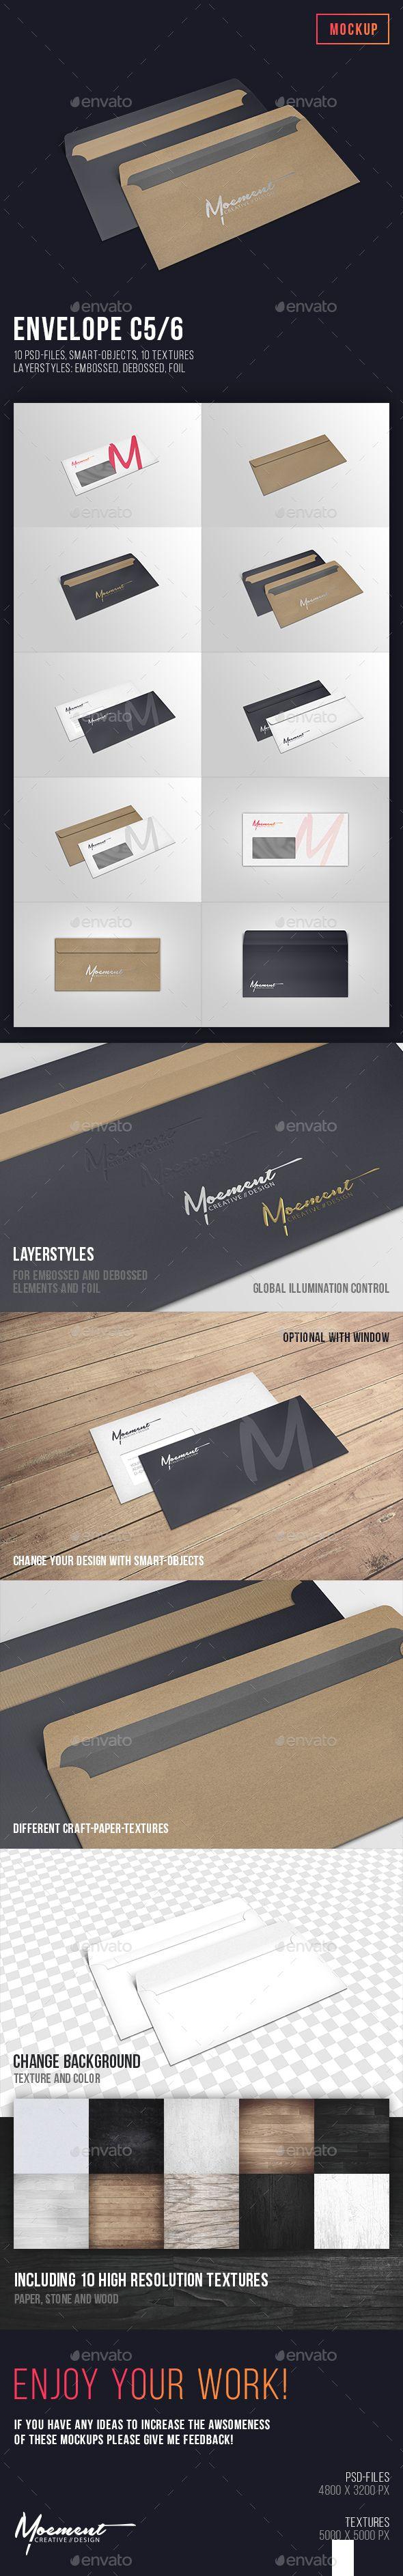 Envelope C5/6 Mockup